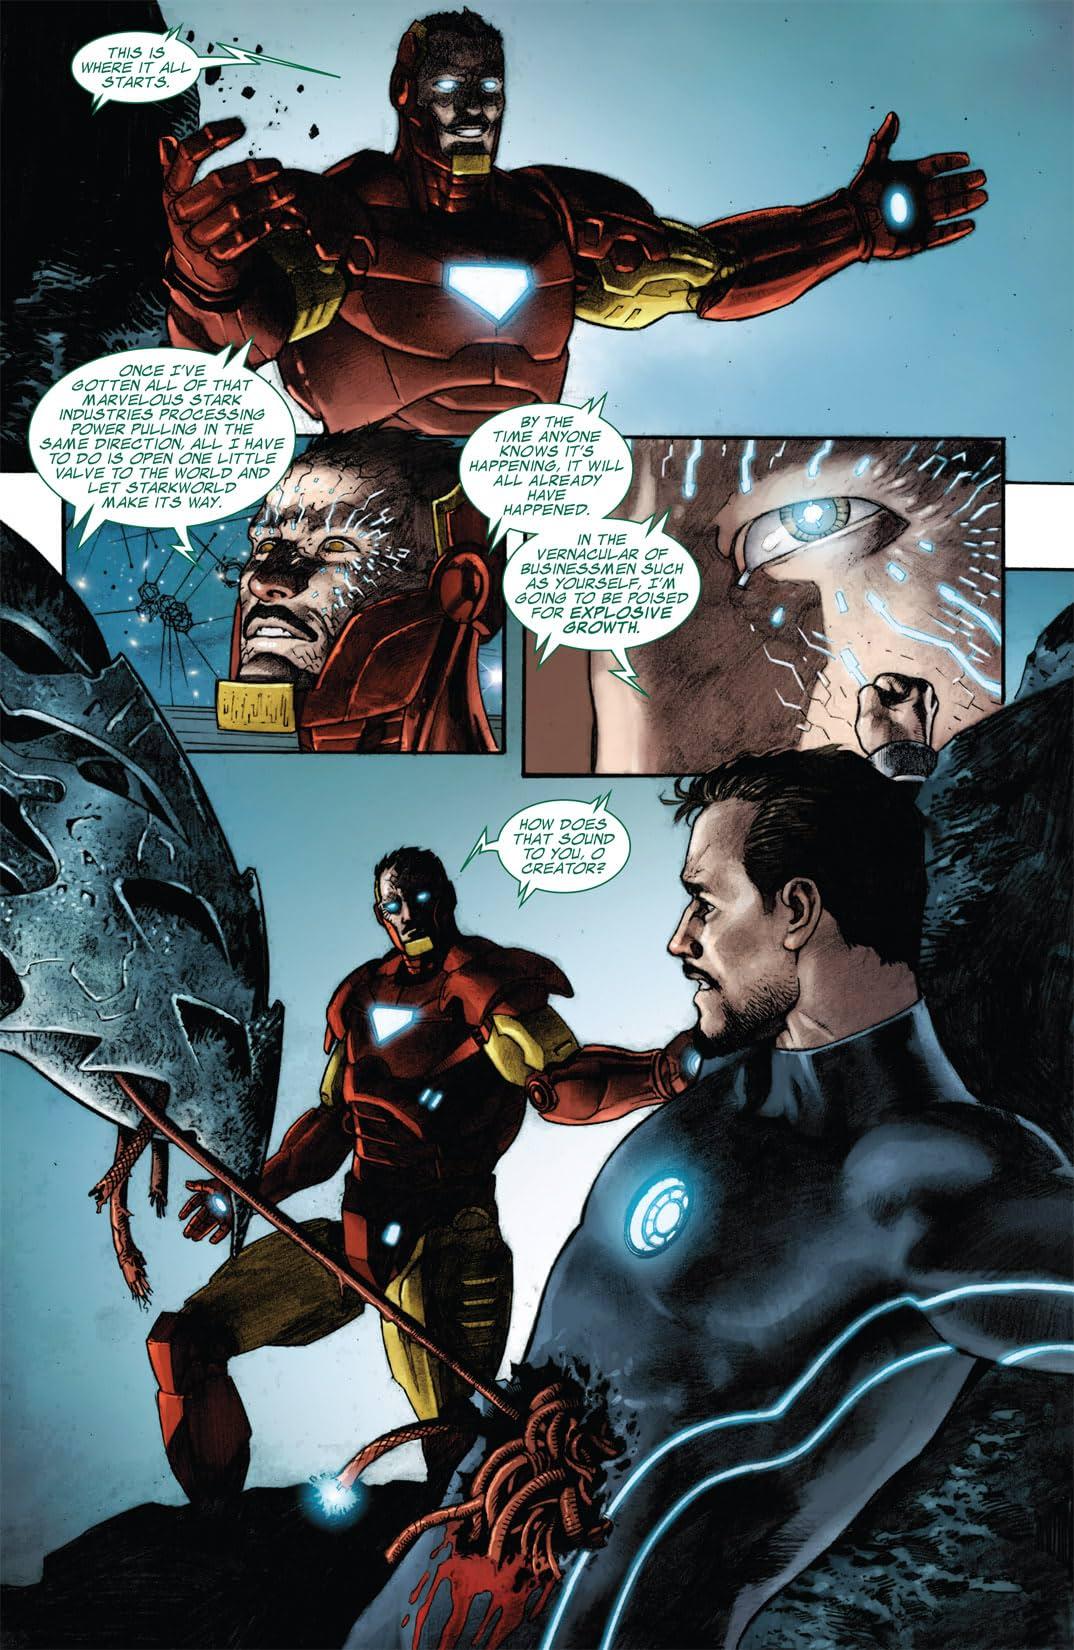 Iron Man: The Rapture #3 (of 4)